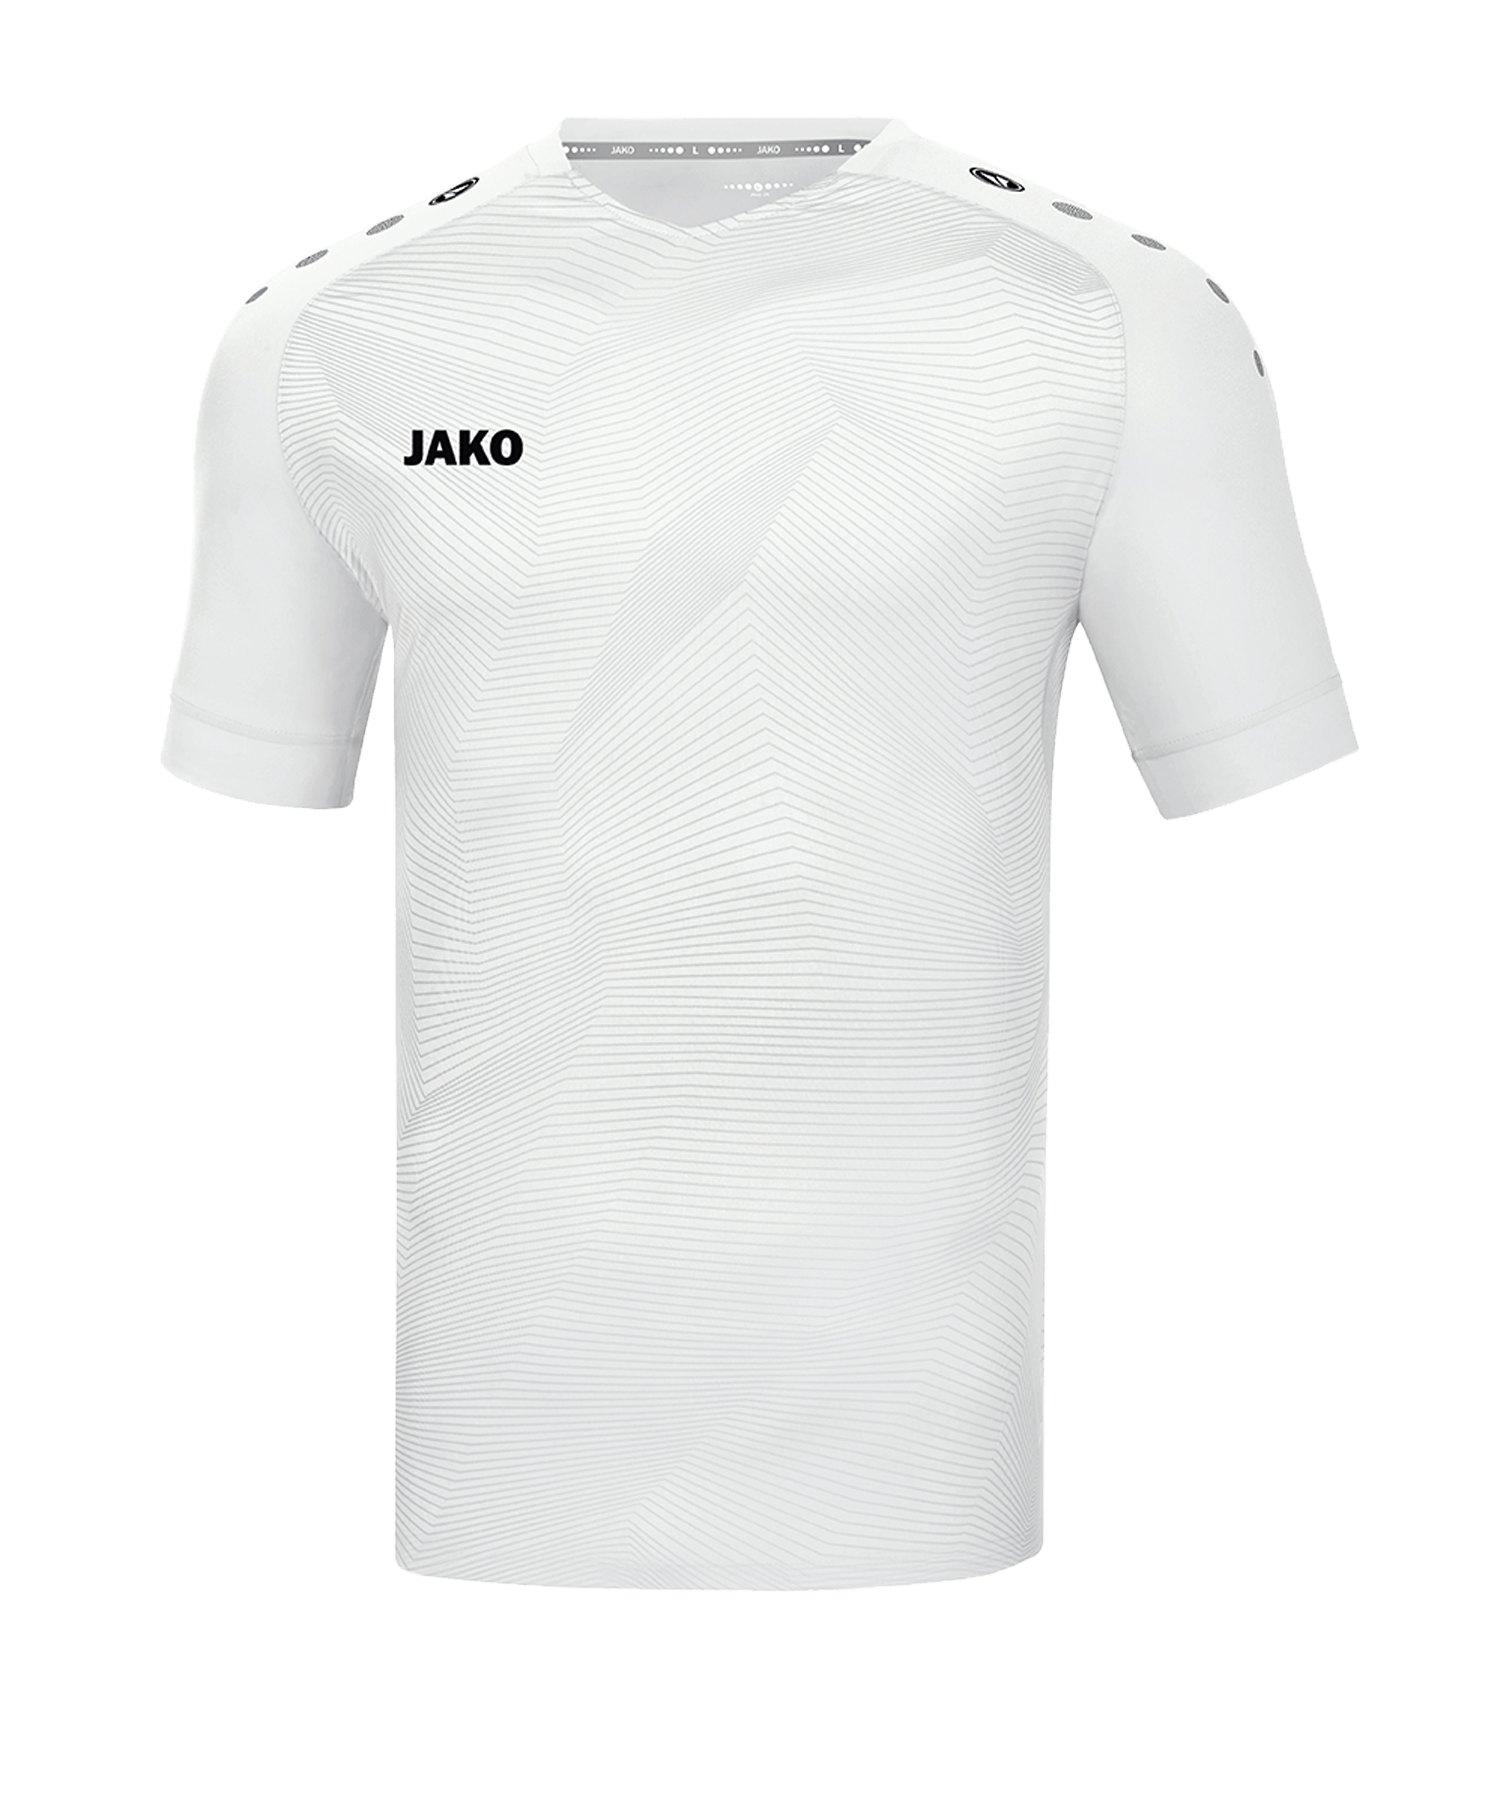 JAKO Premium Trikot kurzarm Weiss F00 - weiss